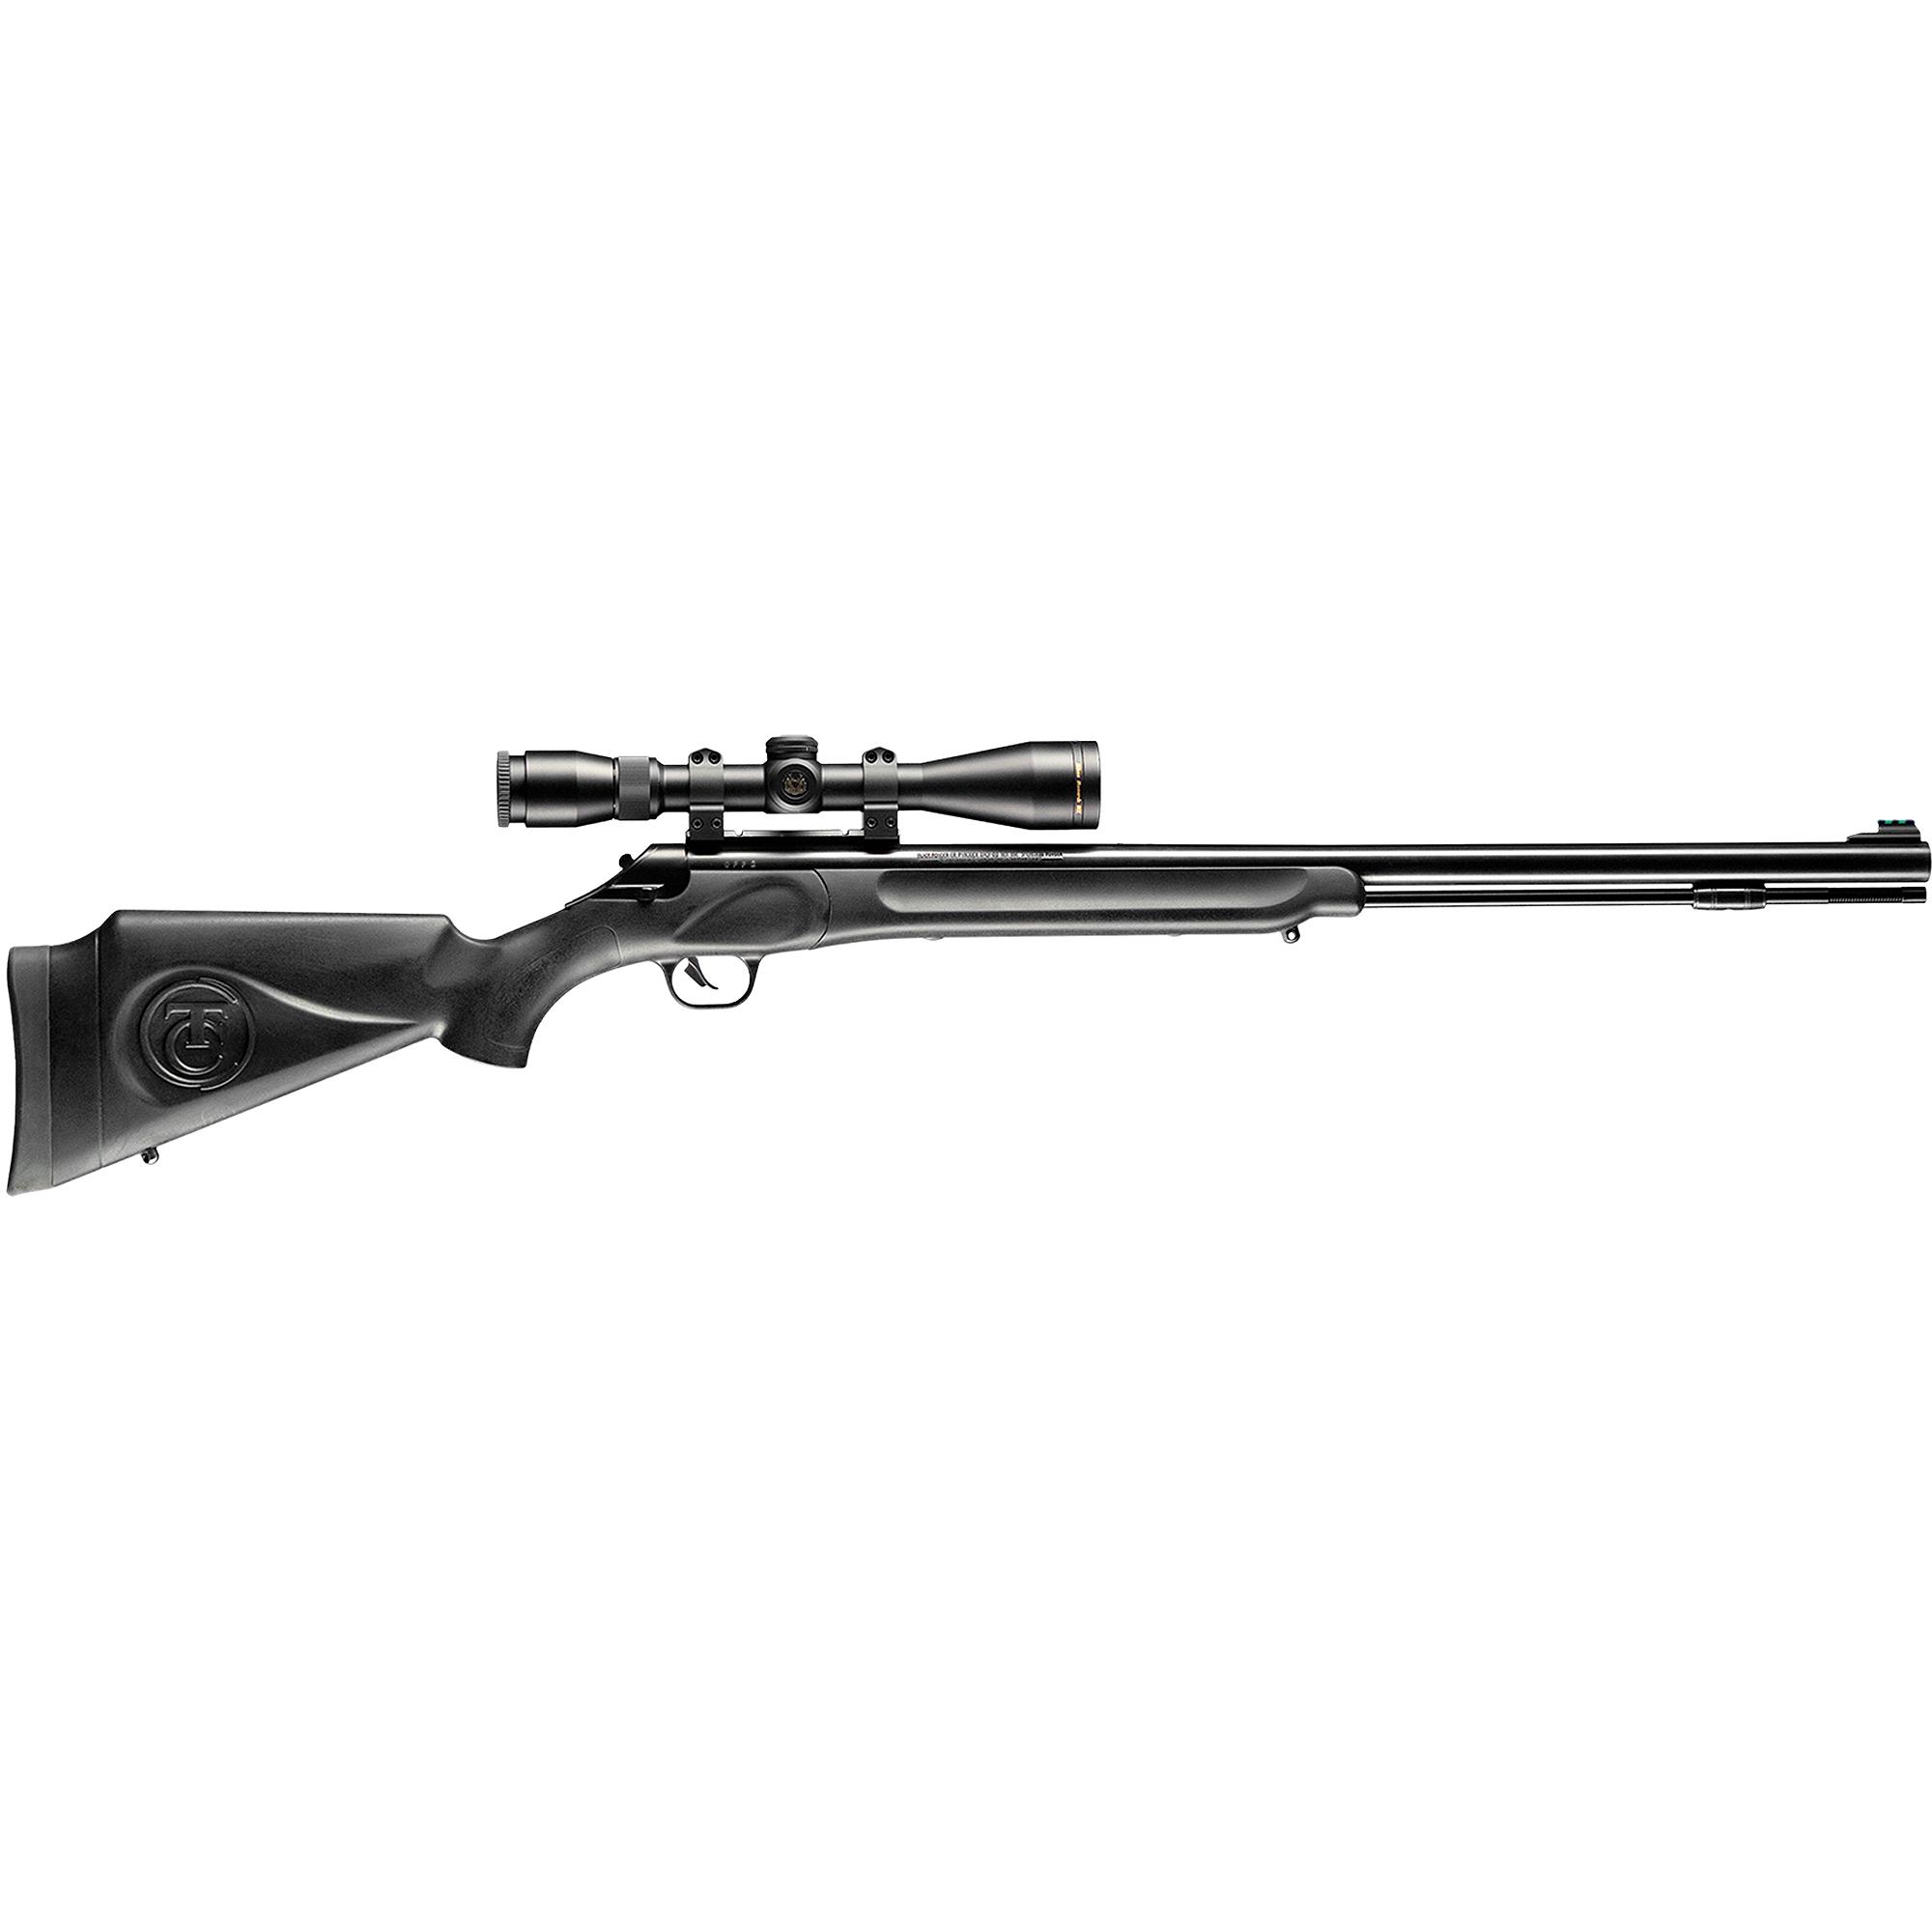 56271 Thompson/Center Arms Impact .50 Cal Muzzleloader Blue/Composite